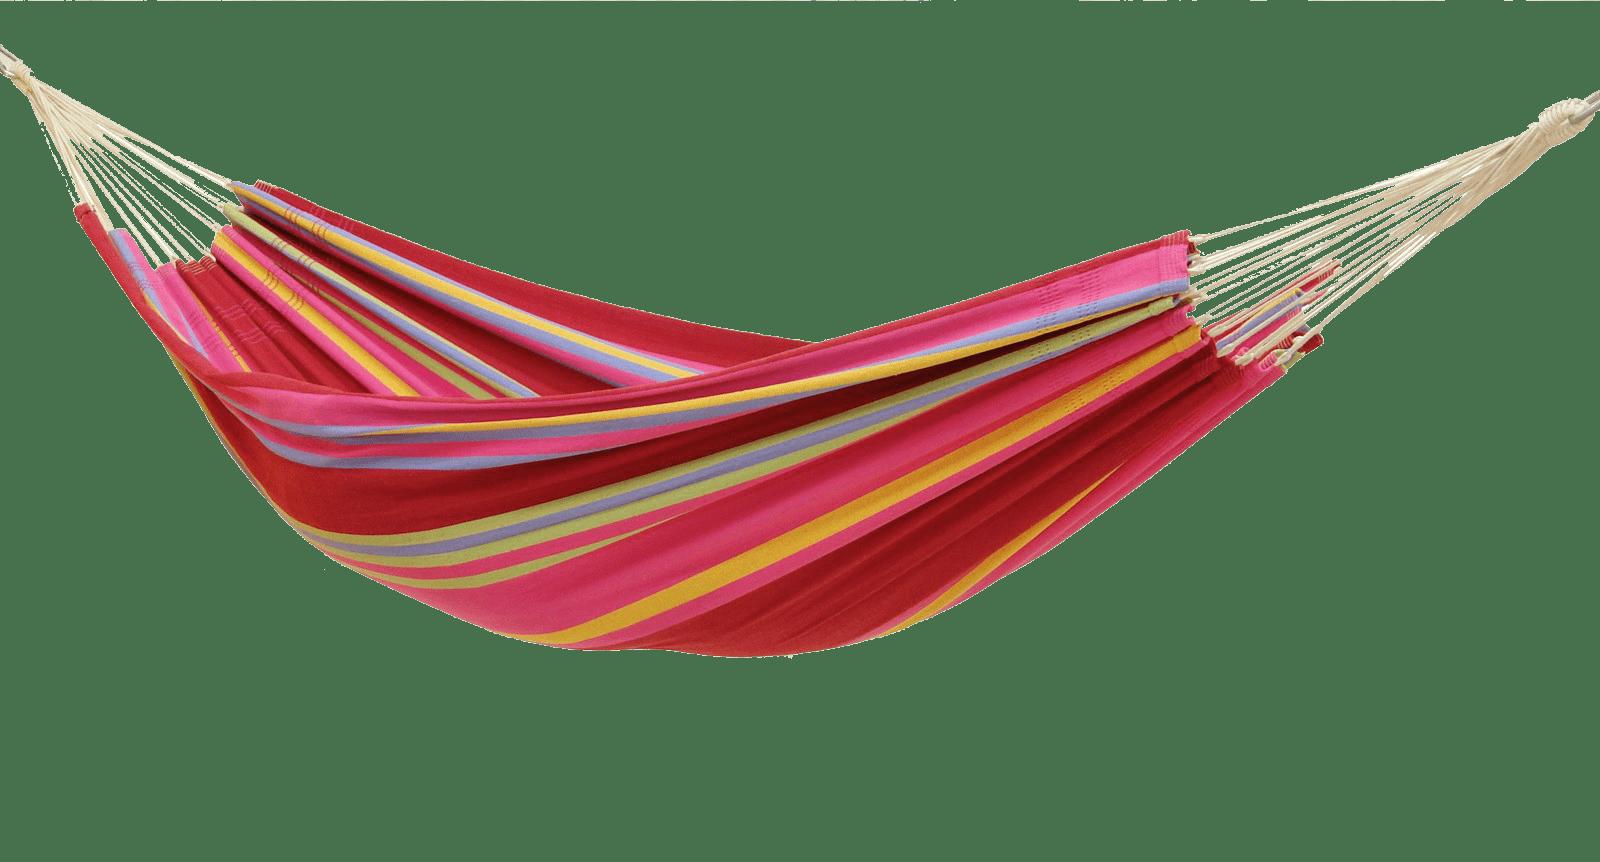 image royalty free download Clipart hammock. Hammocks transparent png images